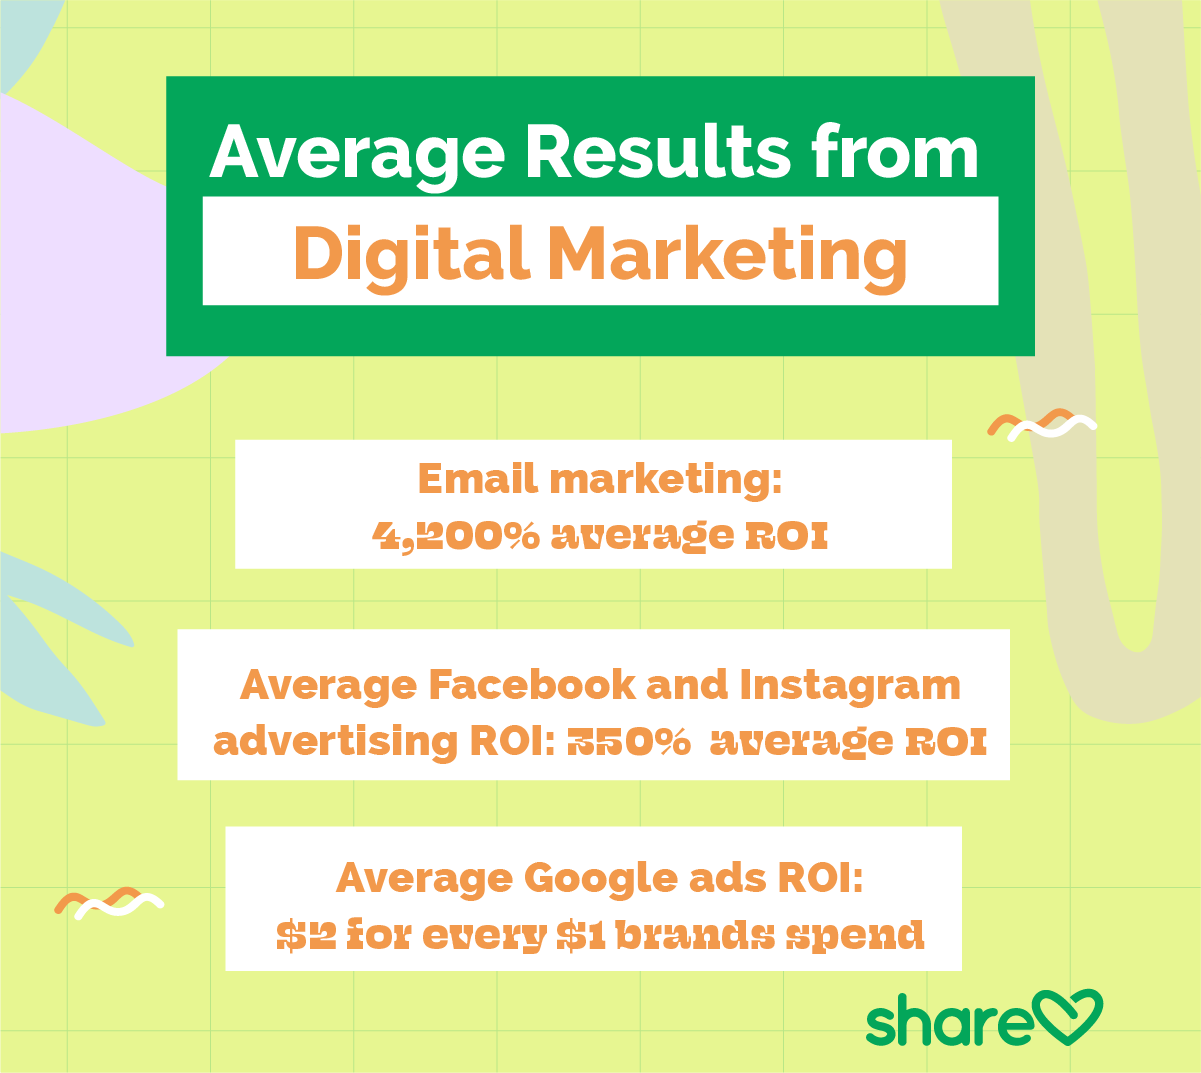 average results from digital marketing